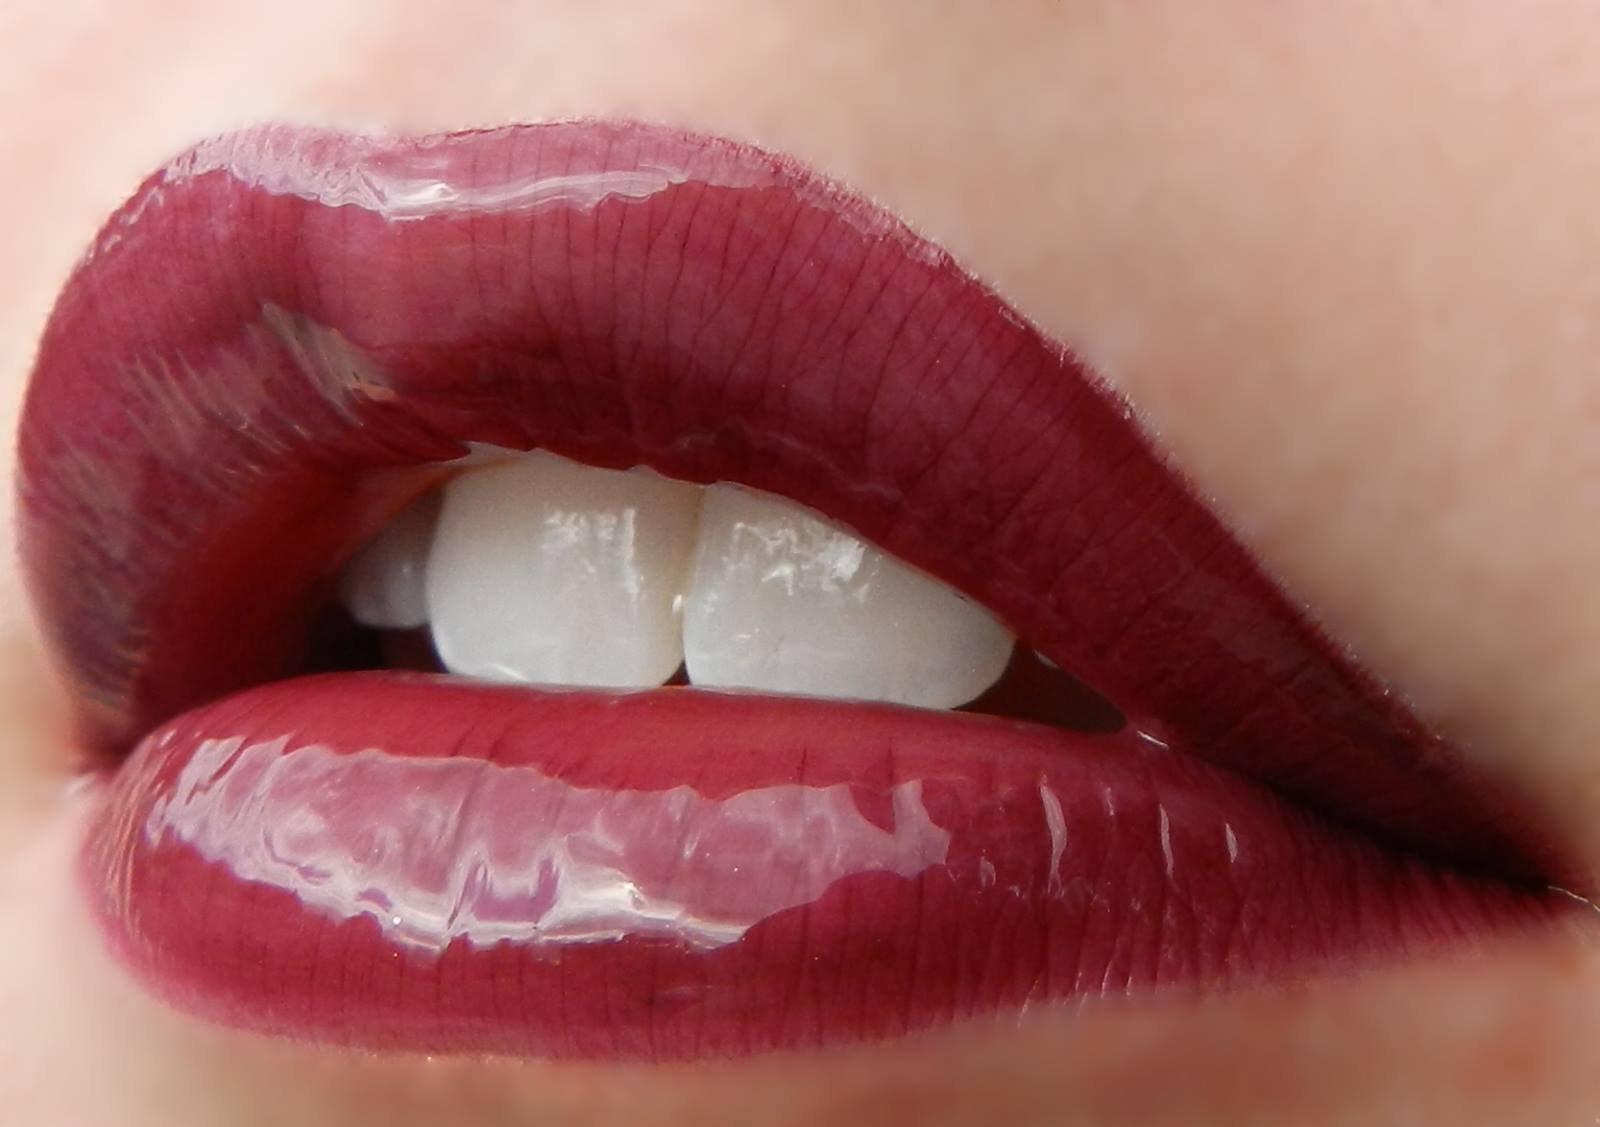 LipSense Bundle - 2 Items, 1 Color and 1 Glossy Gloss (Plum)